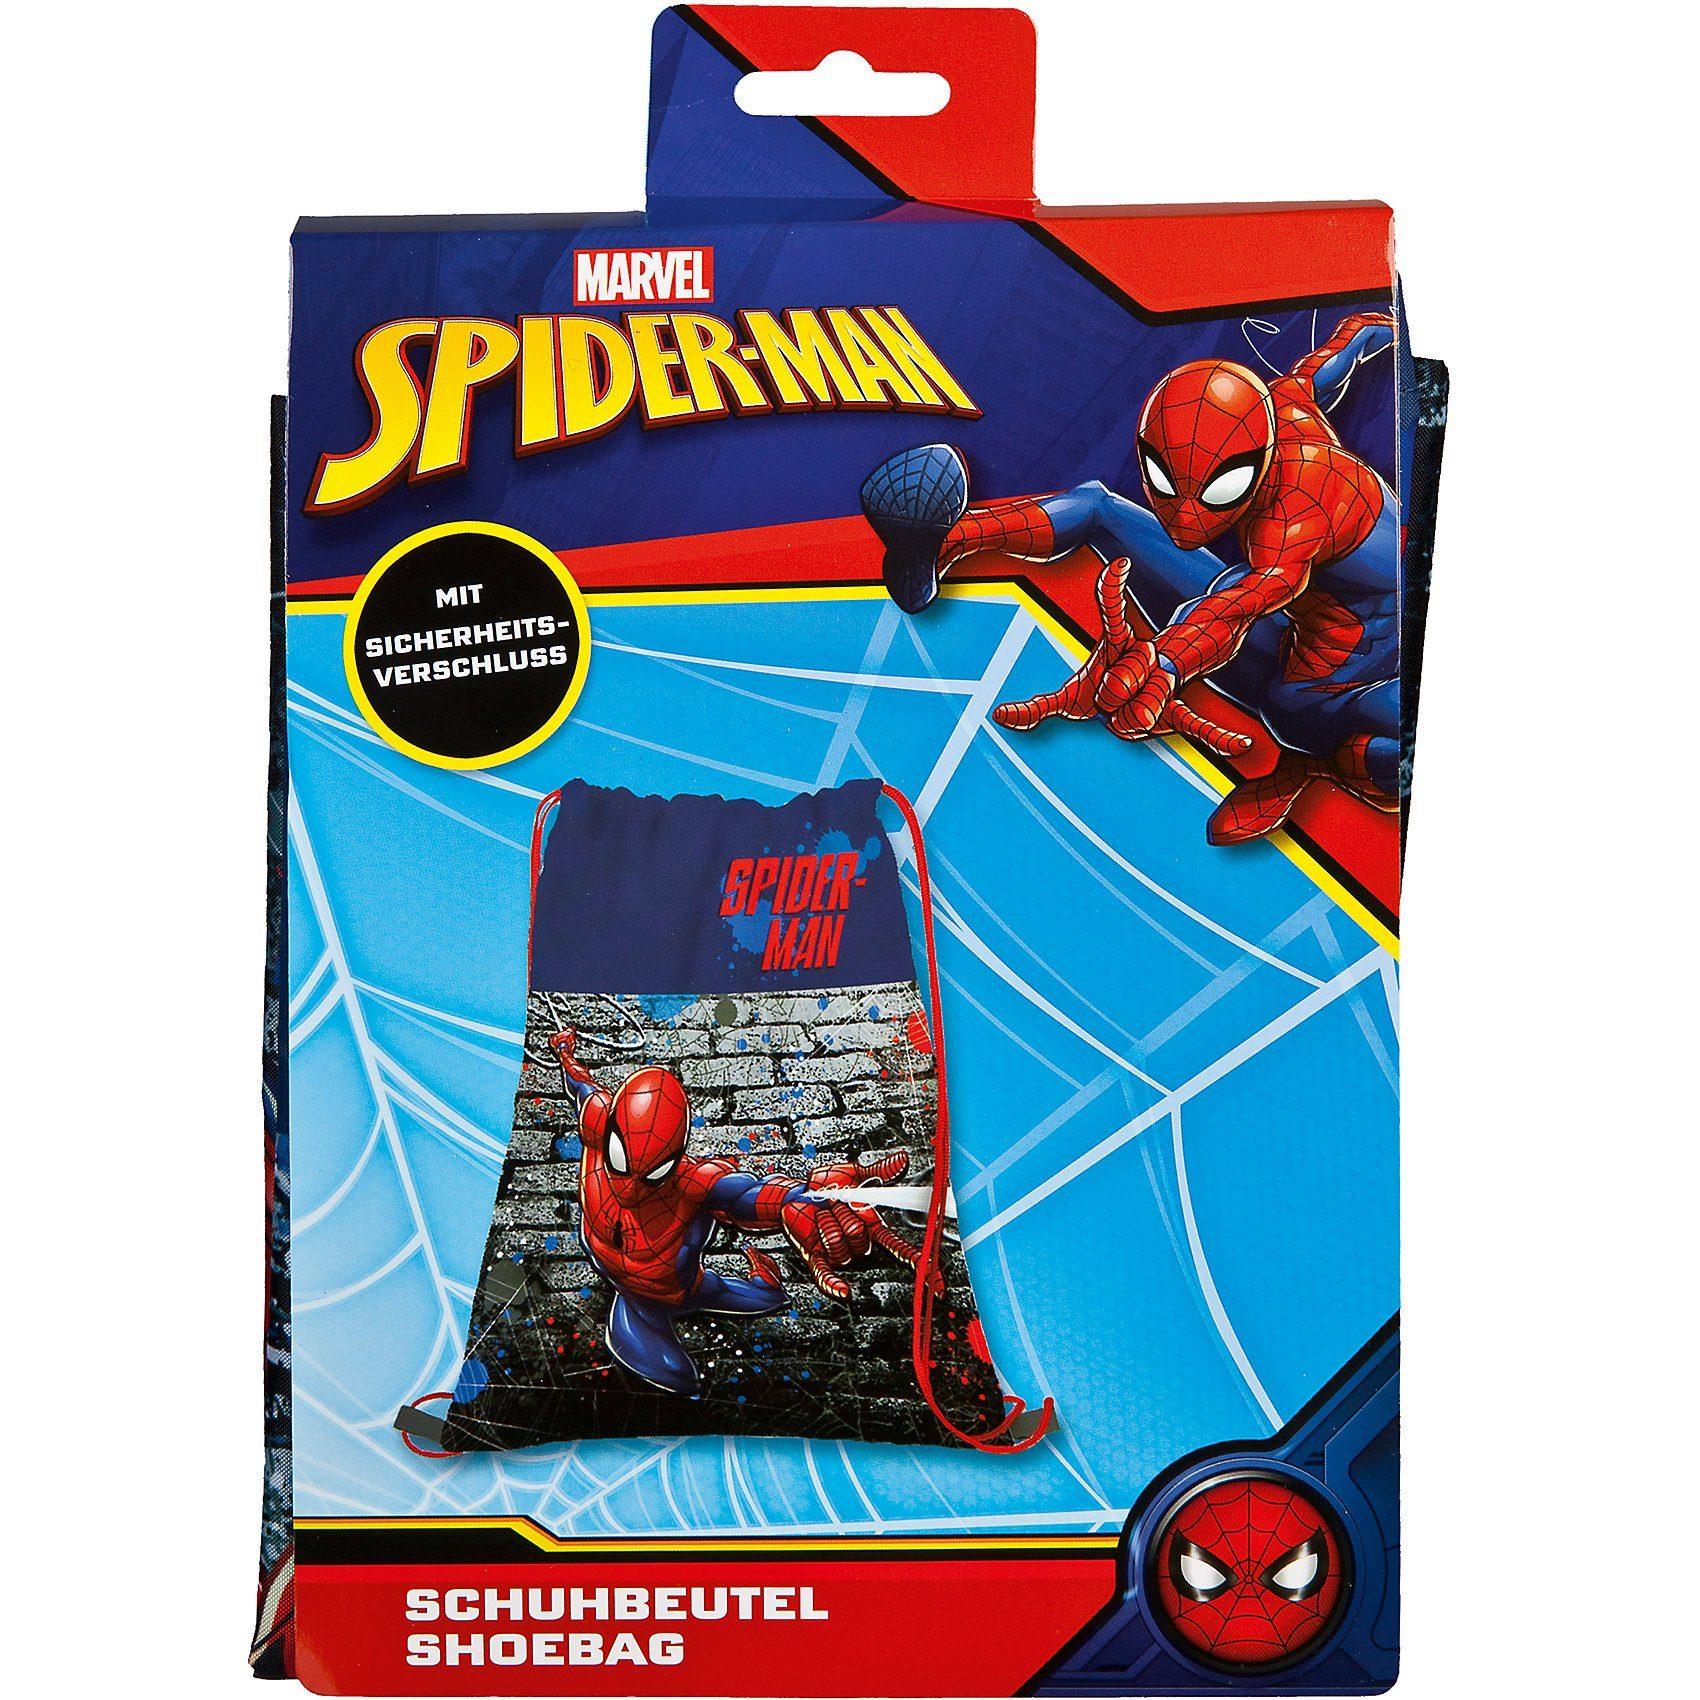 UNDERCOVER Sportbeutel Spider-Man